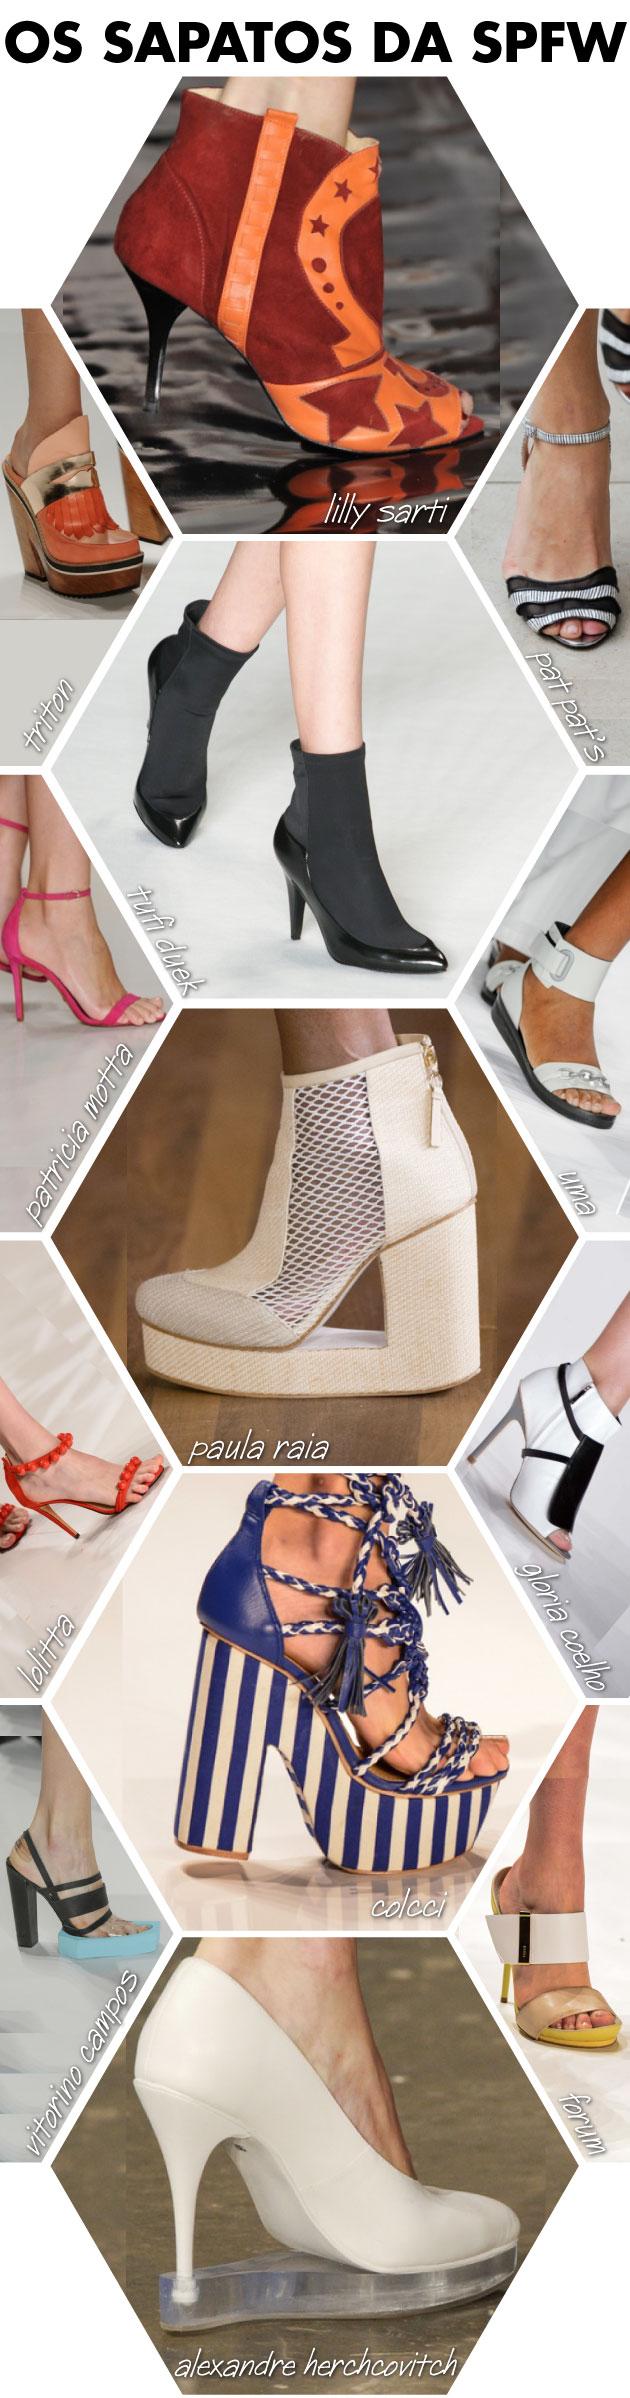 sapatos-spfw-2014-plataformas-saltos-acrilico-sapatos-diferentes1